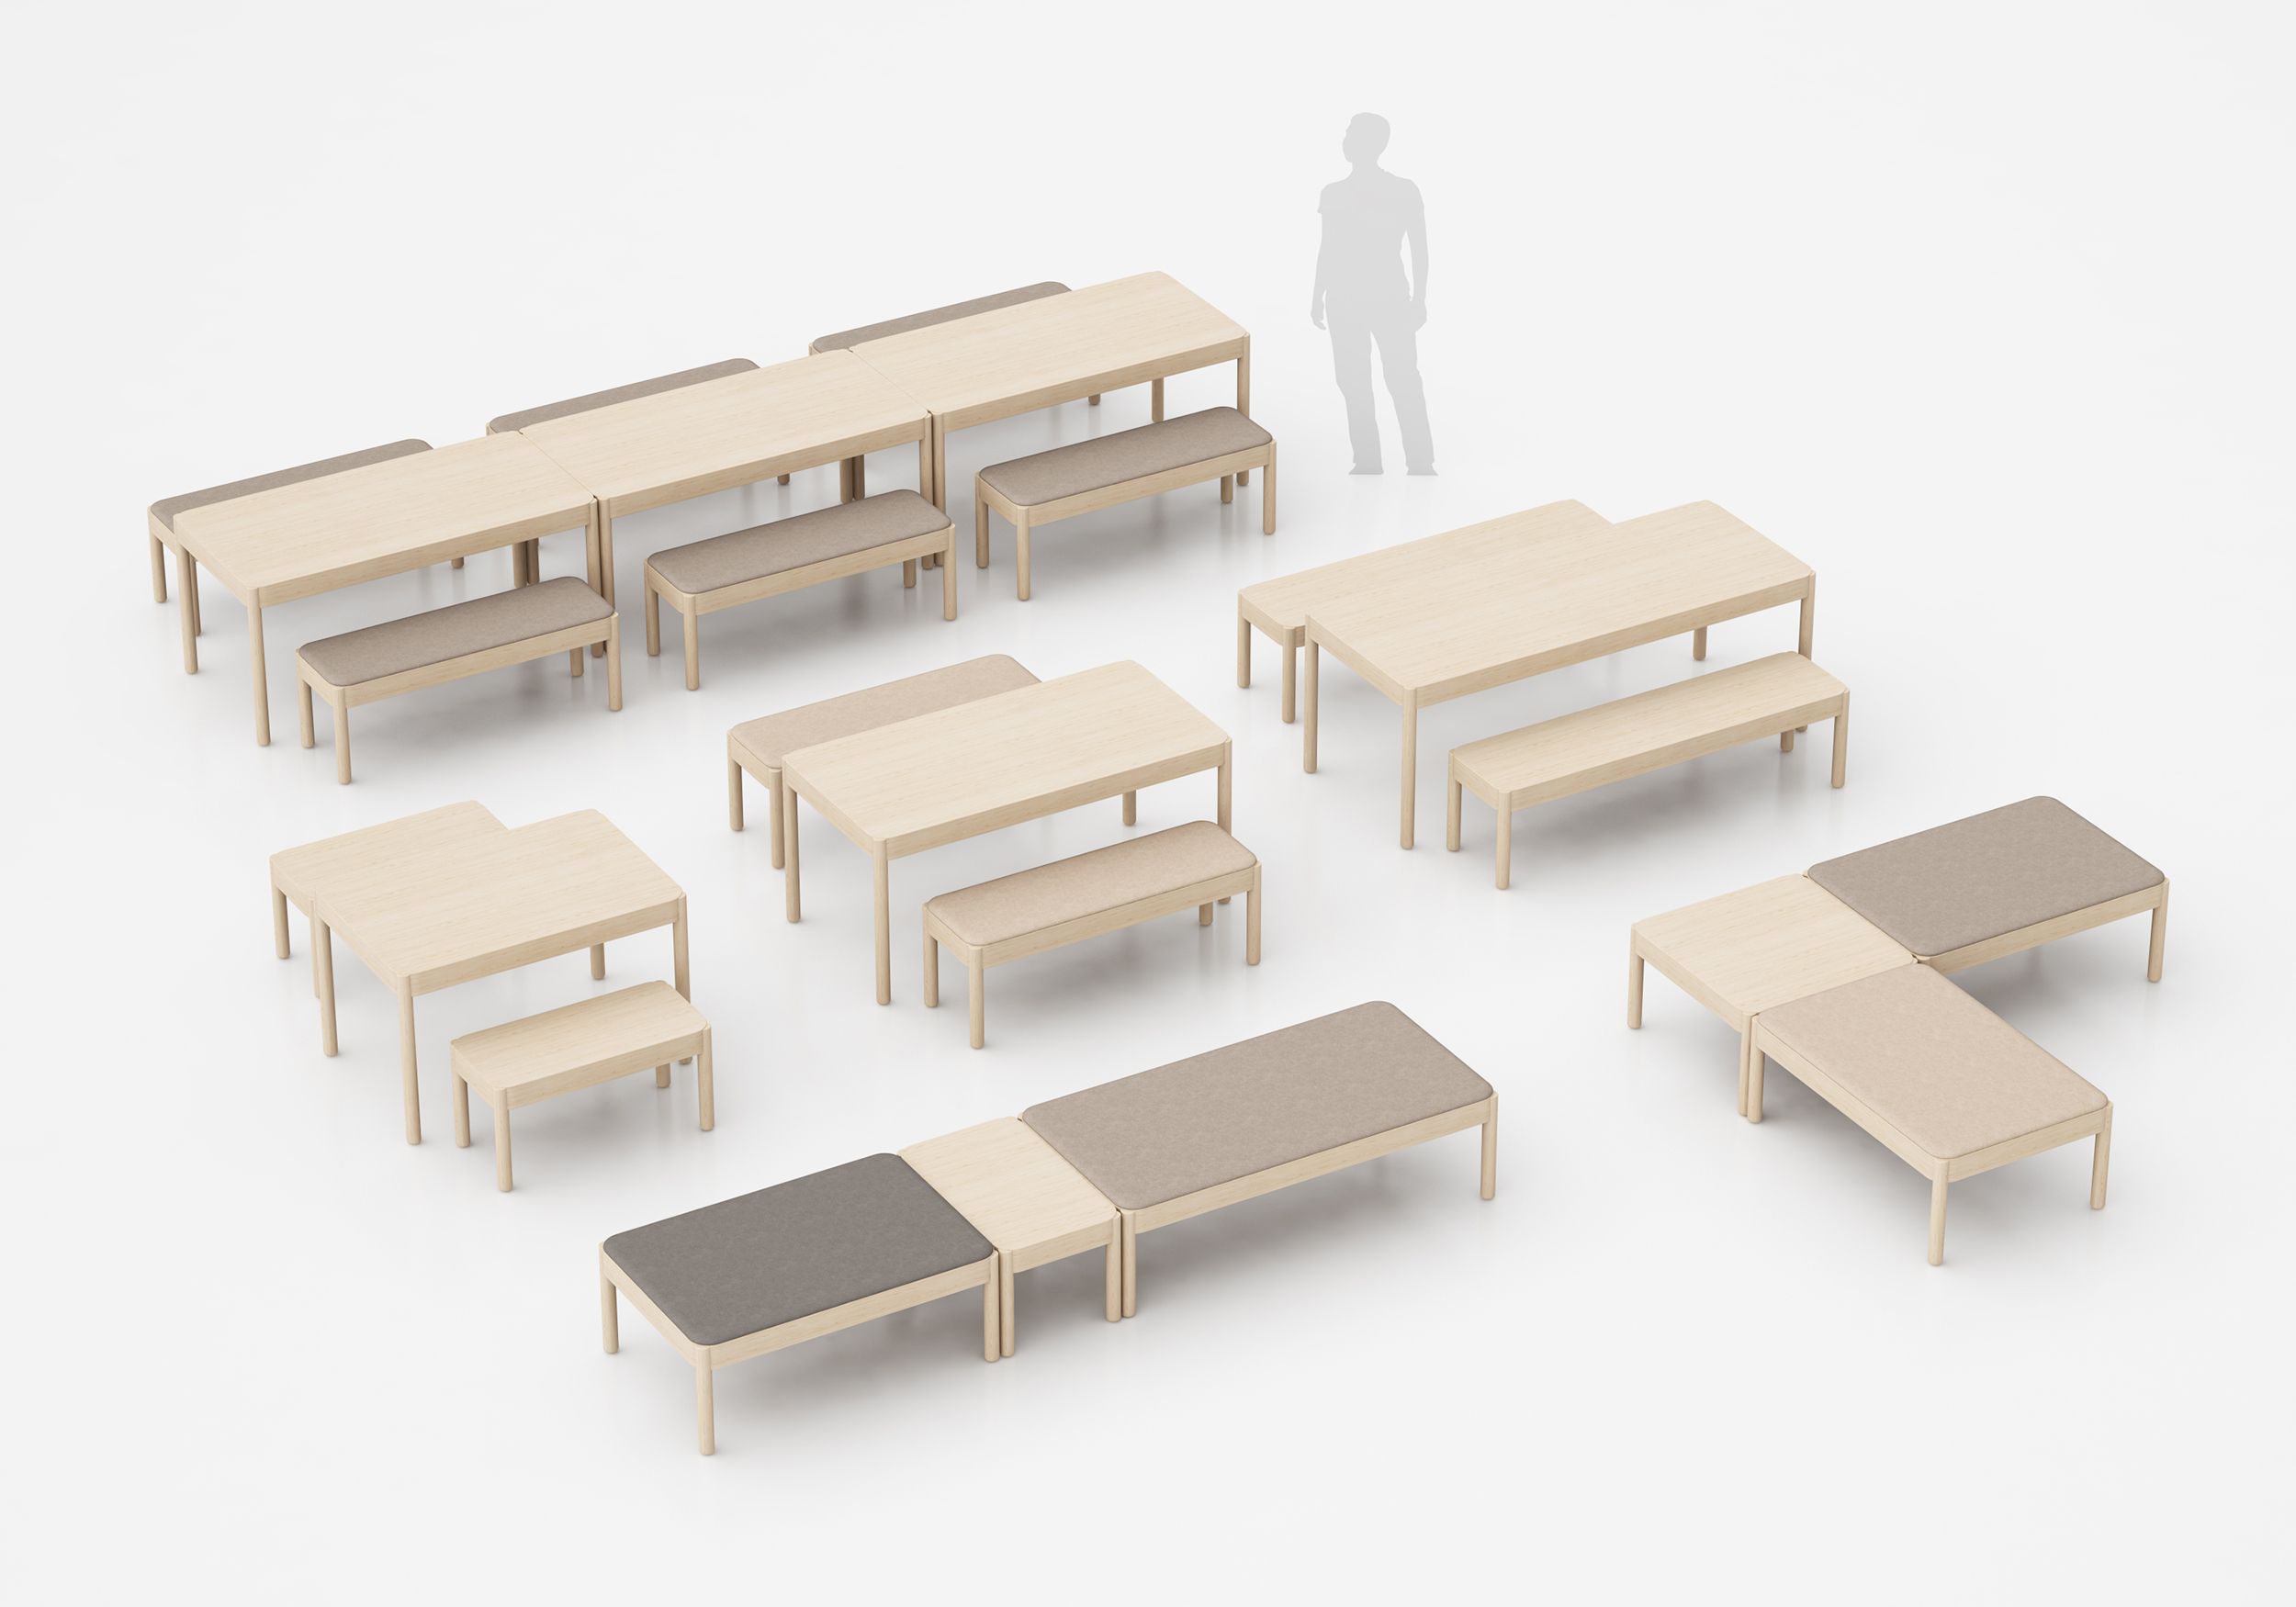 Wakufuru Collection - Design by Johan Kauppi for Glimakra of Sweden